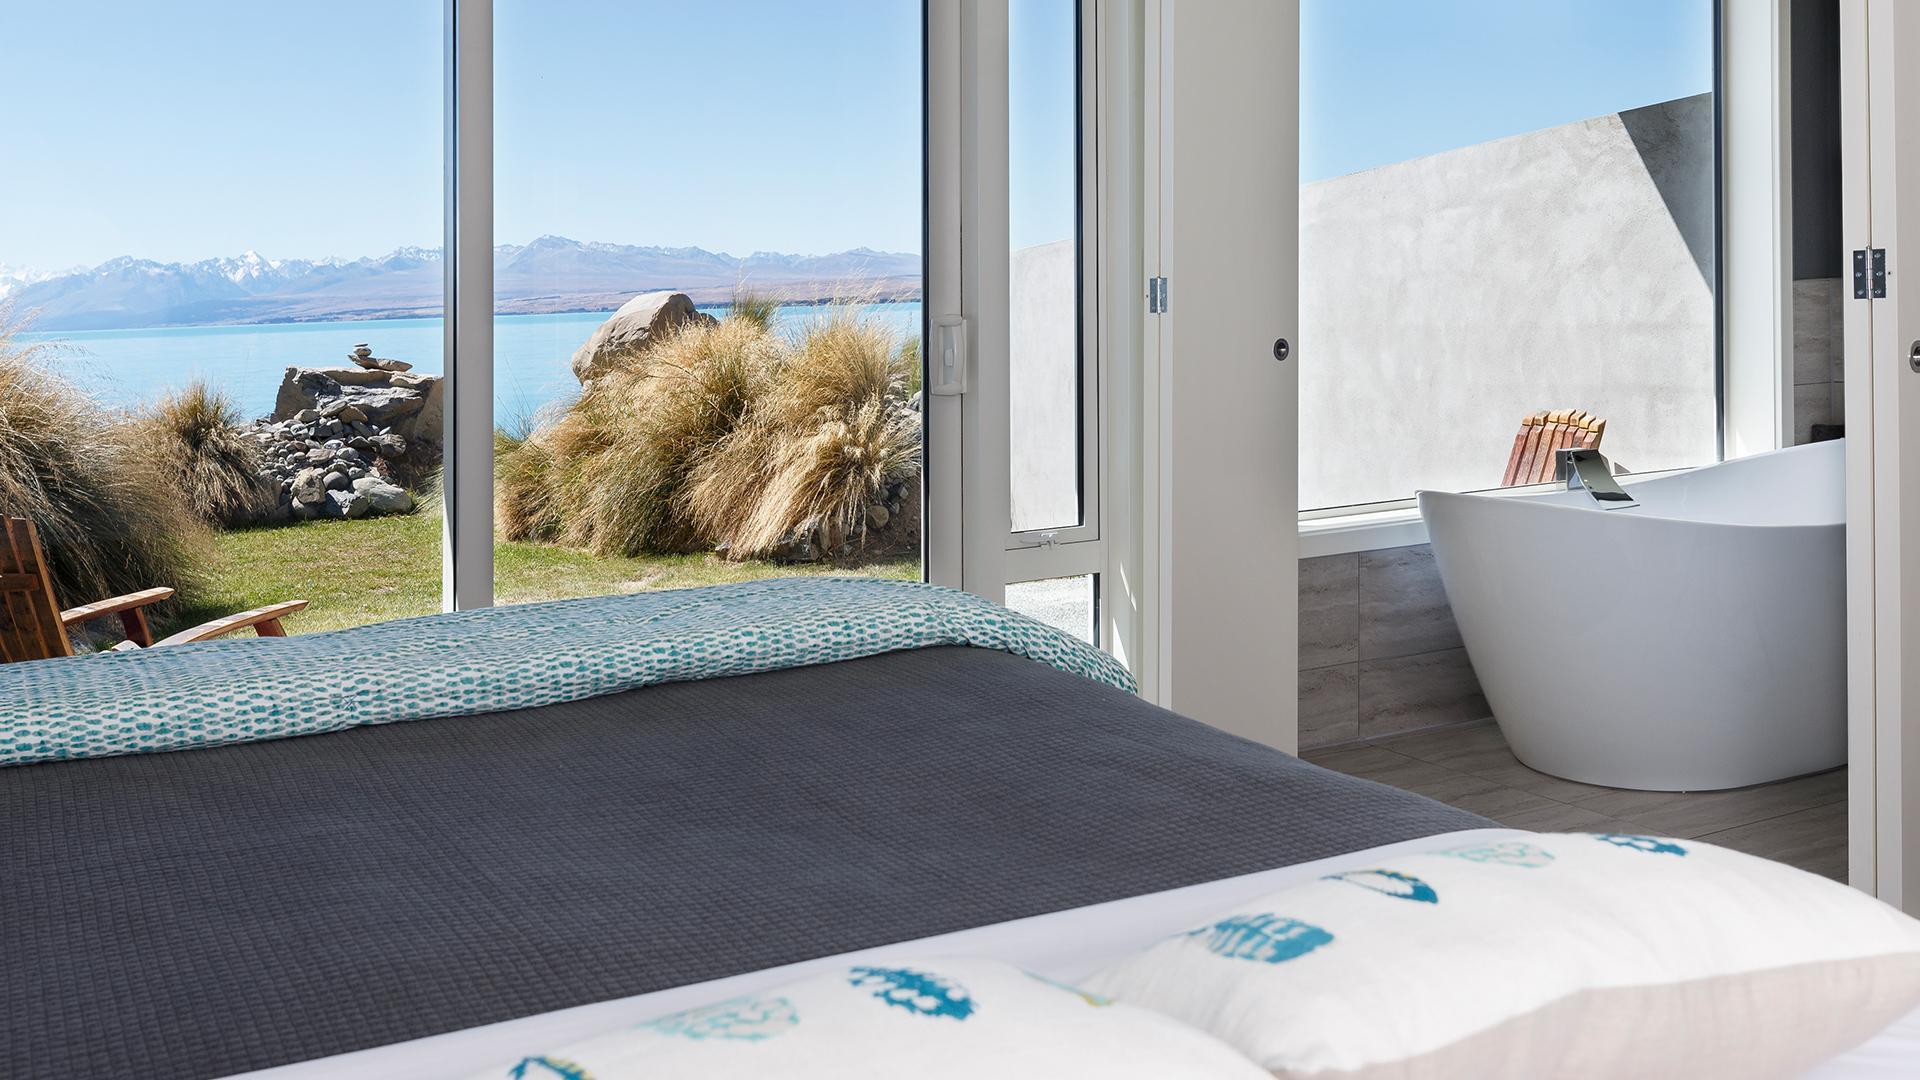 Lake-View Room image 1 at Lakestone Lodge by null, Canterbury, New Zealand